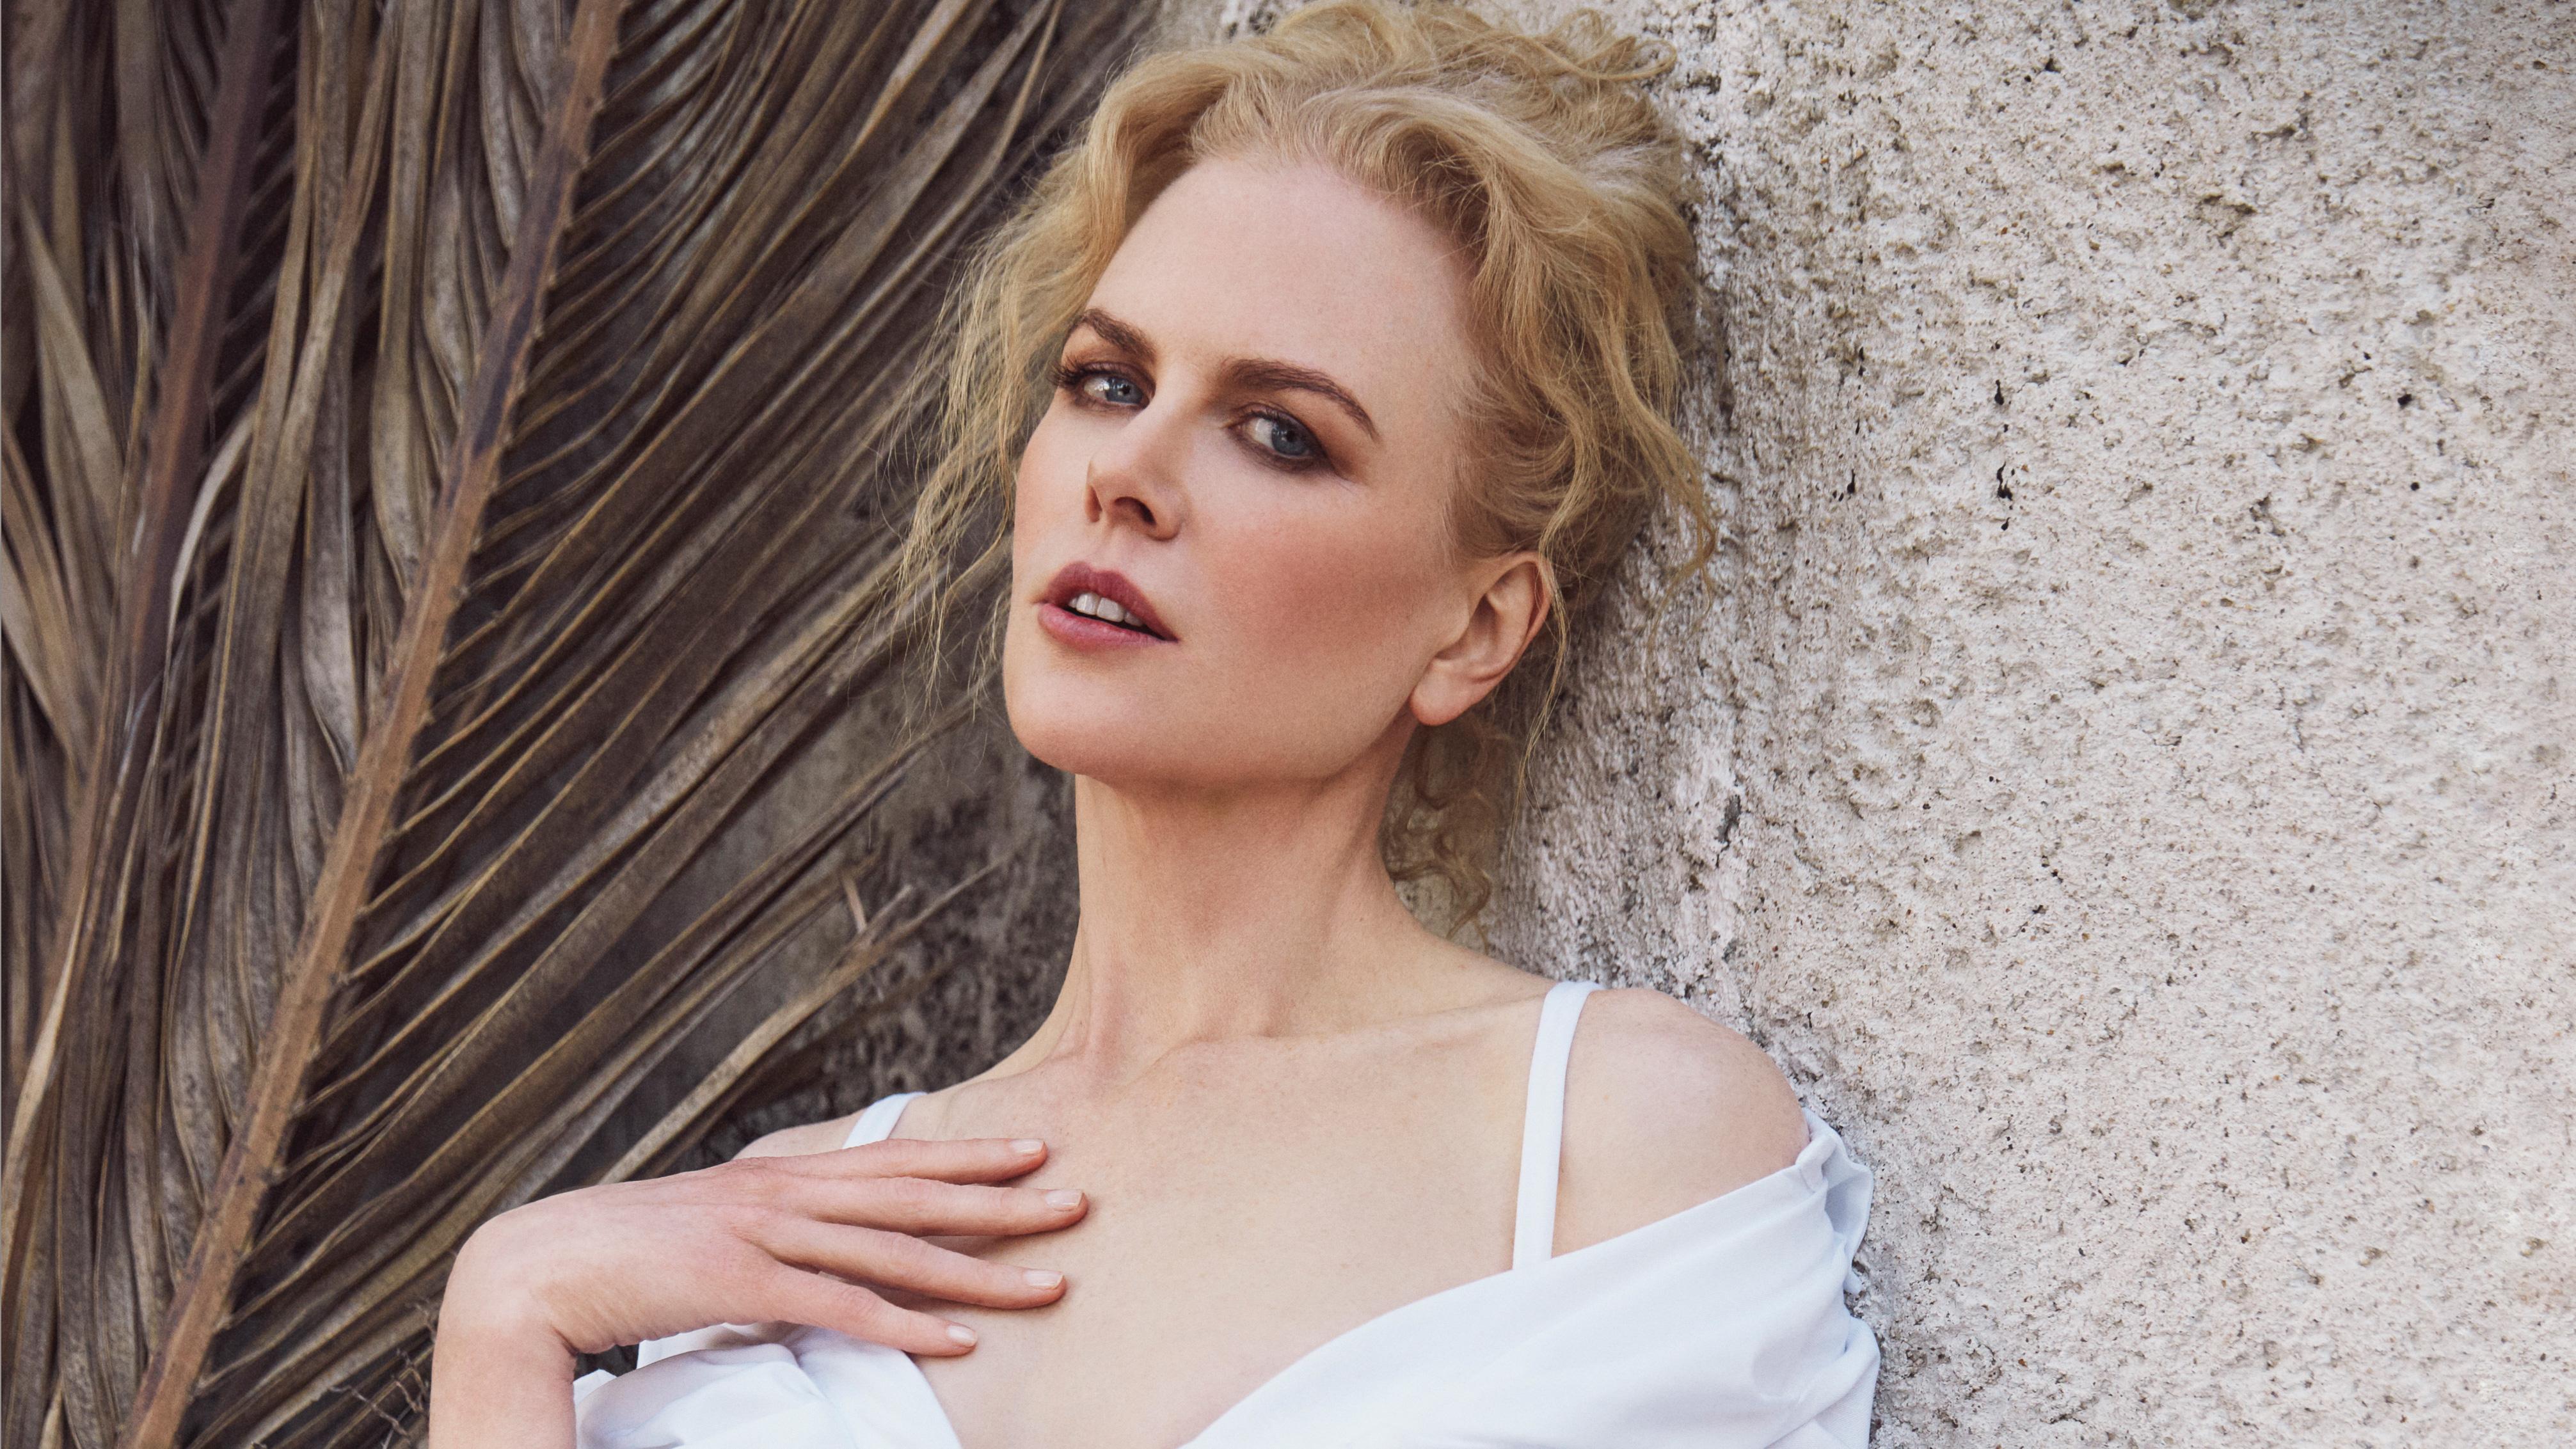 2048x2048 Game Girl Pubg 4k Ipad Air Hd 4k Wallpapers: 2048x2048 Nicole Kidman 4k The Hollywood Reporter 2018